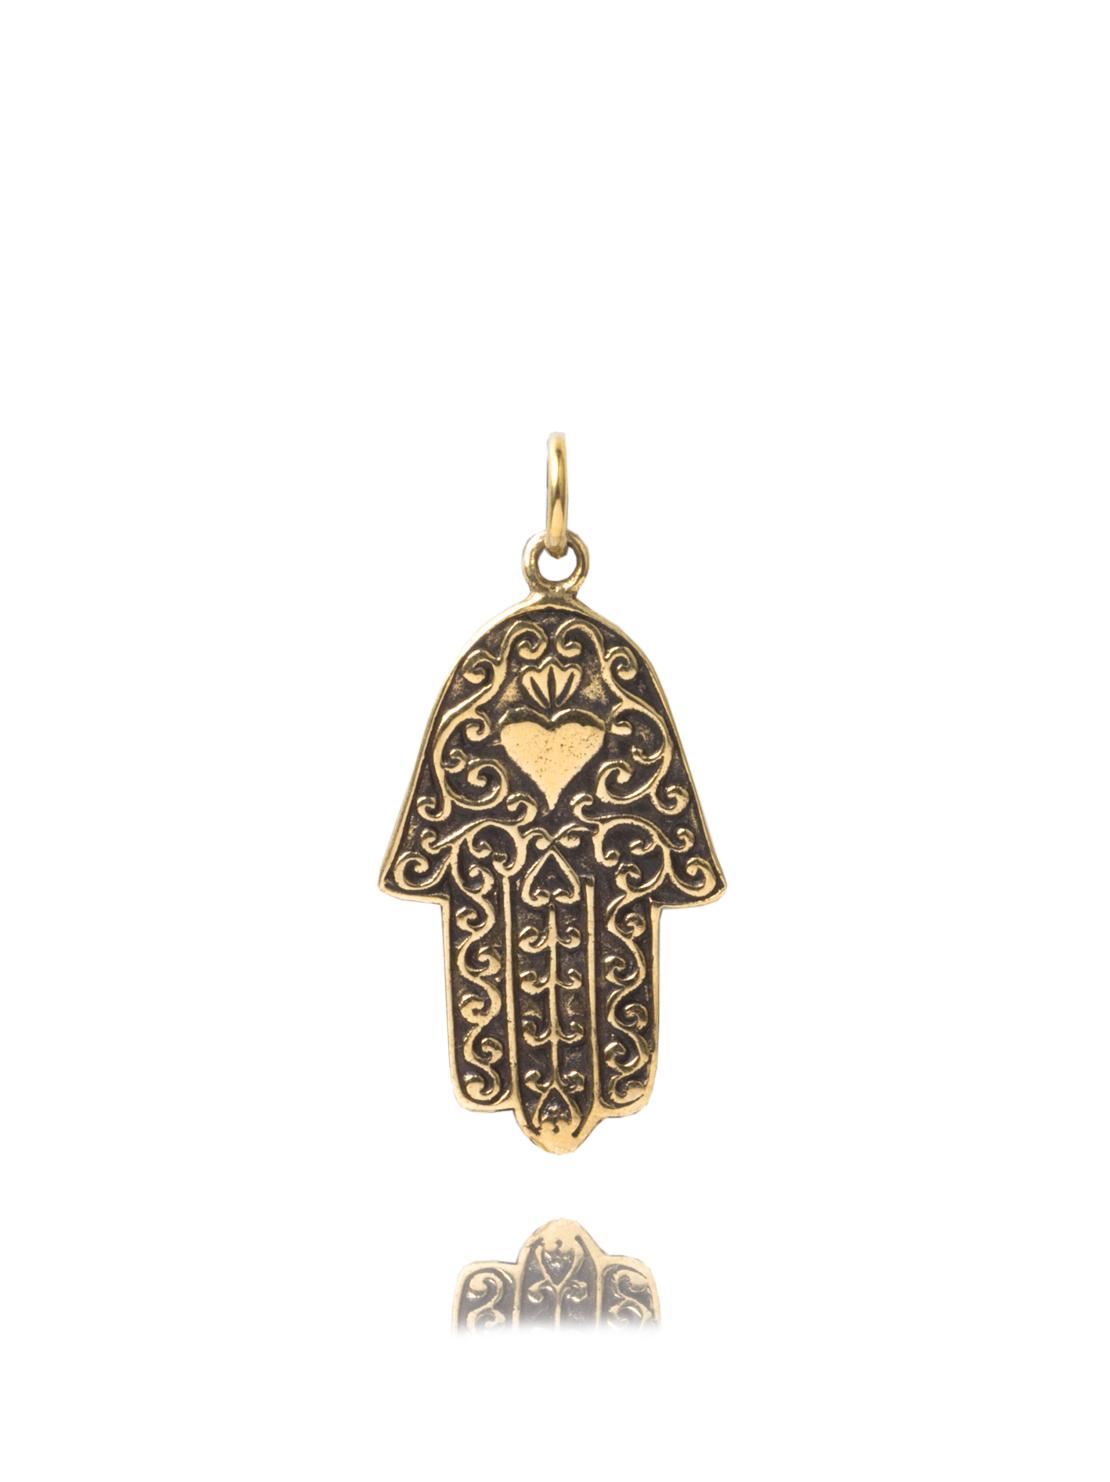 Original Brass Fatima Hand Charm